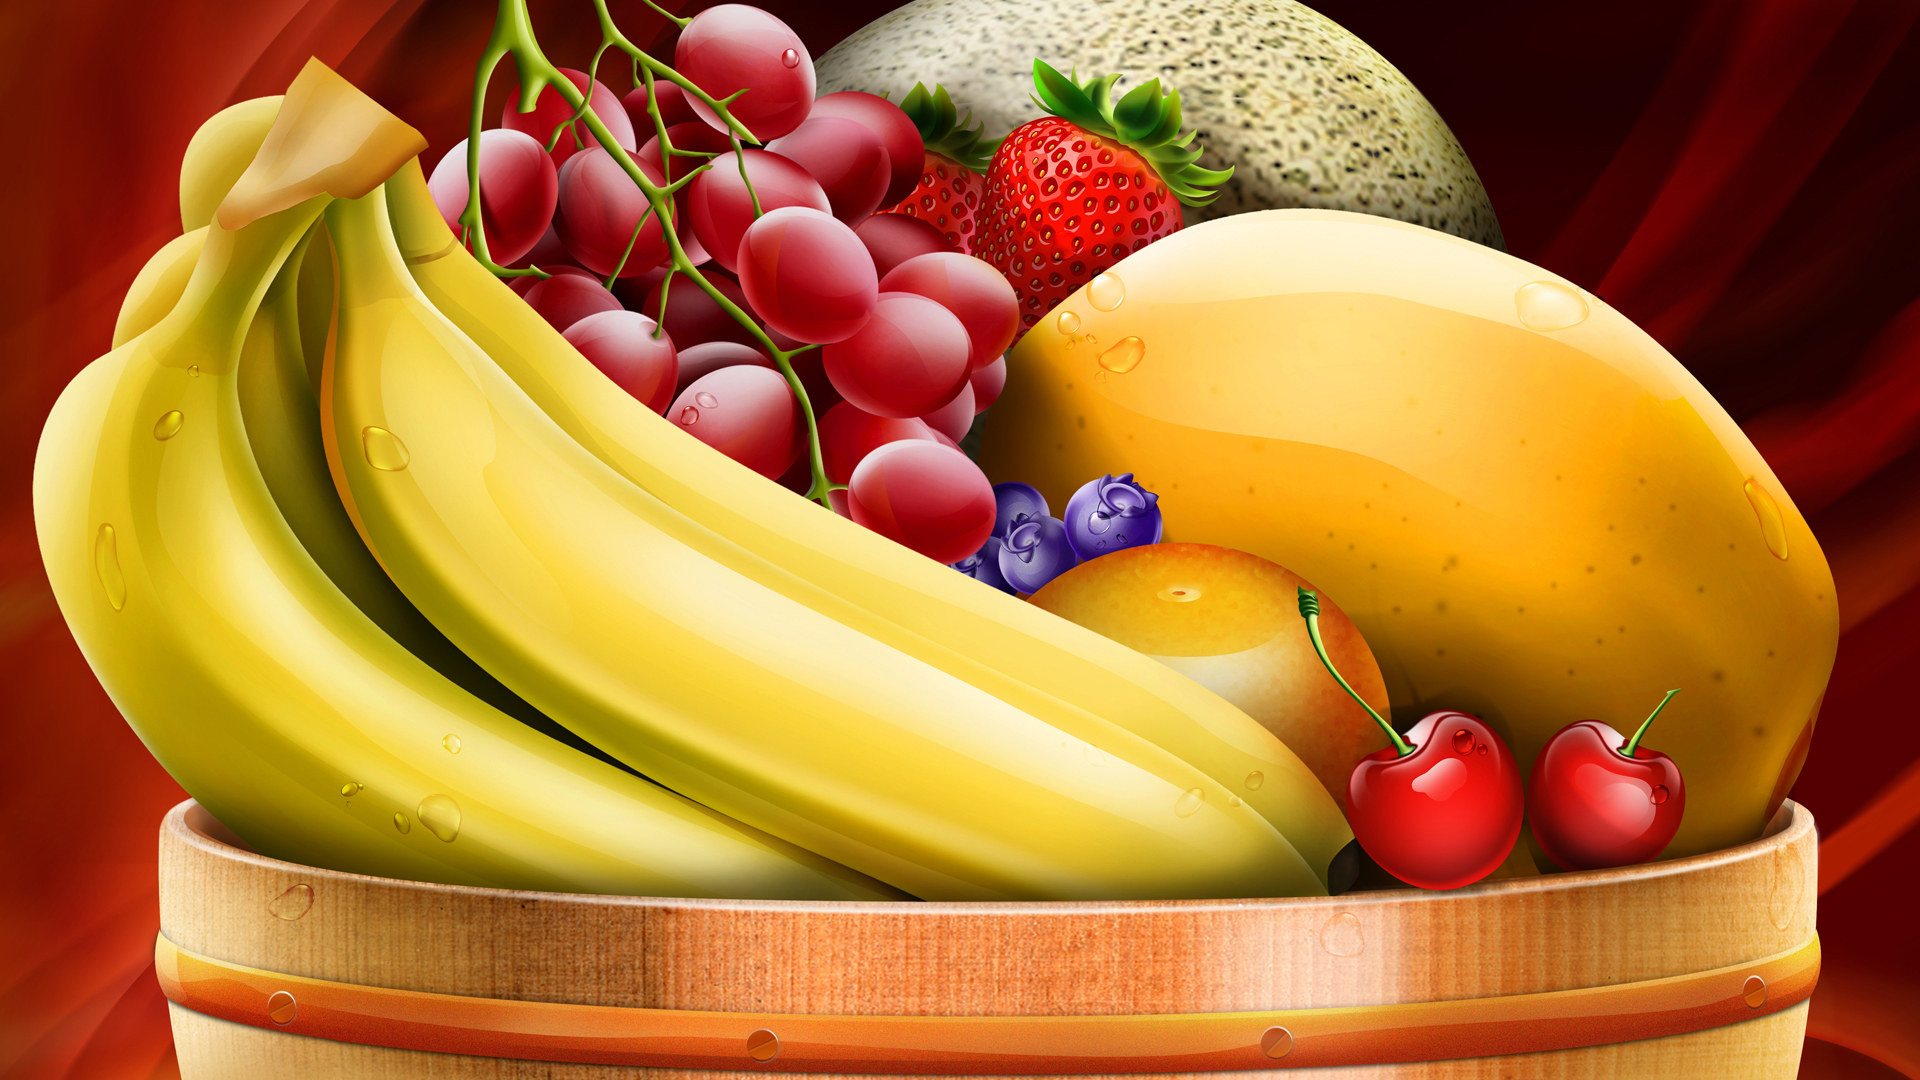 2560x1600 Fruit Desktop Apple Desktop Background Drink Food wallpapers HD .